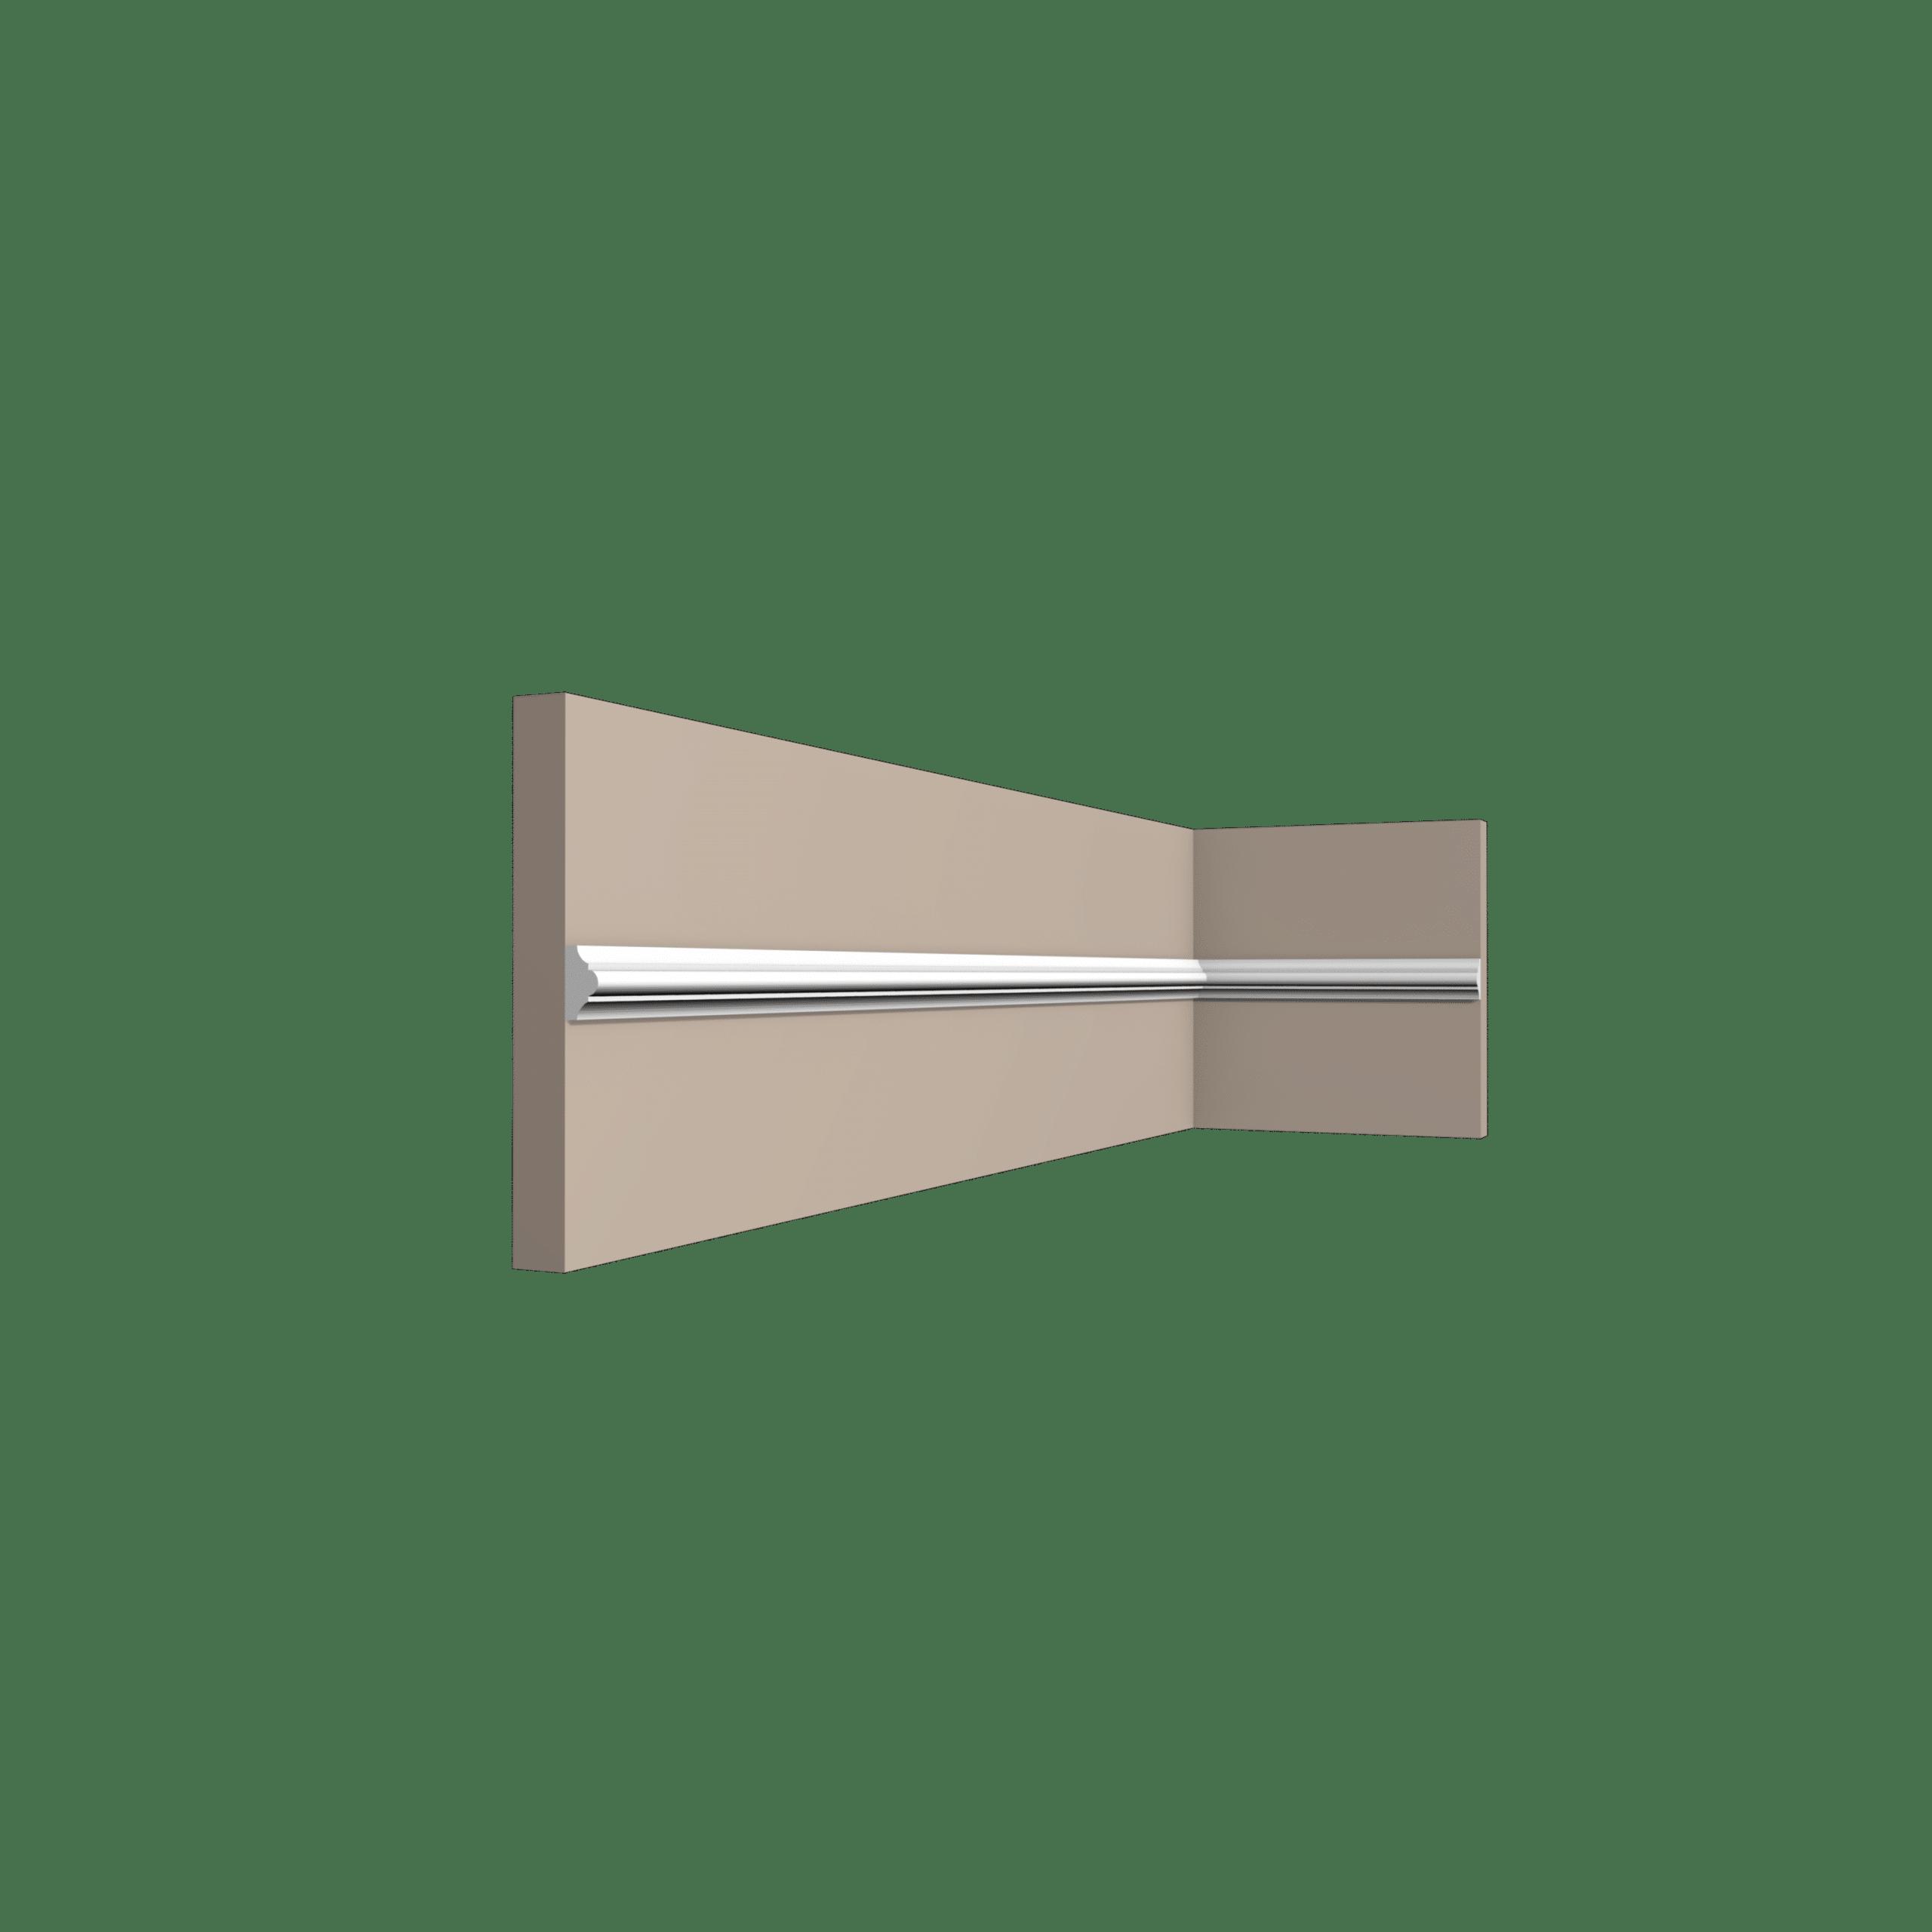 קרניז פוליאוריתן דגם DS - 2607